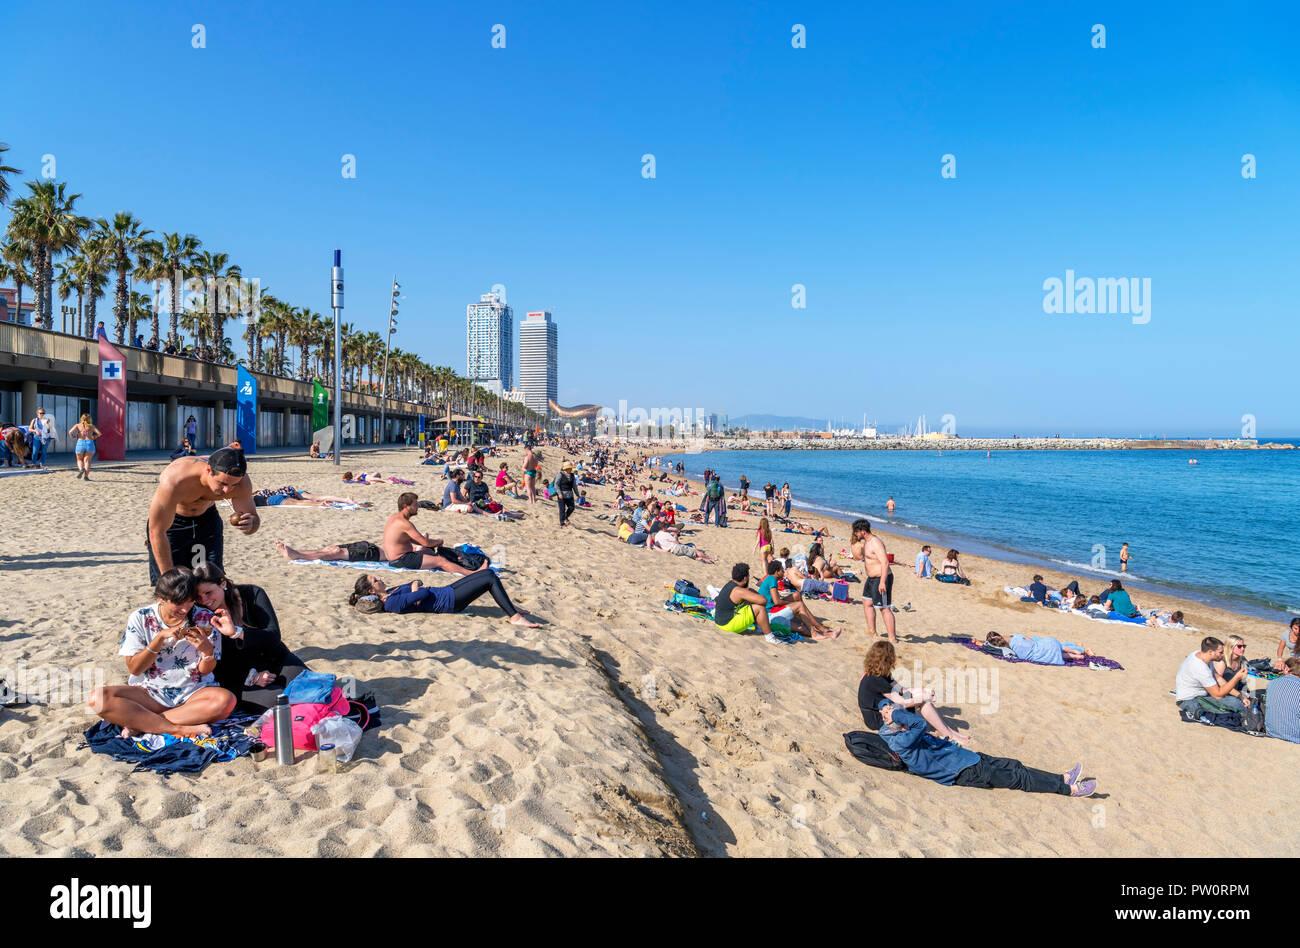 Barcelona beach. The beach in La Barceloneta (Platja de la Barceloneta), Barcelona, Spain Stock Photo